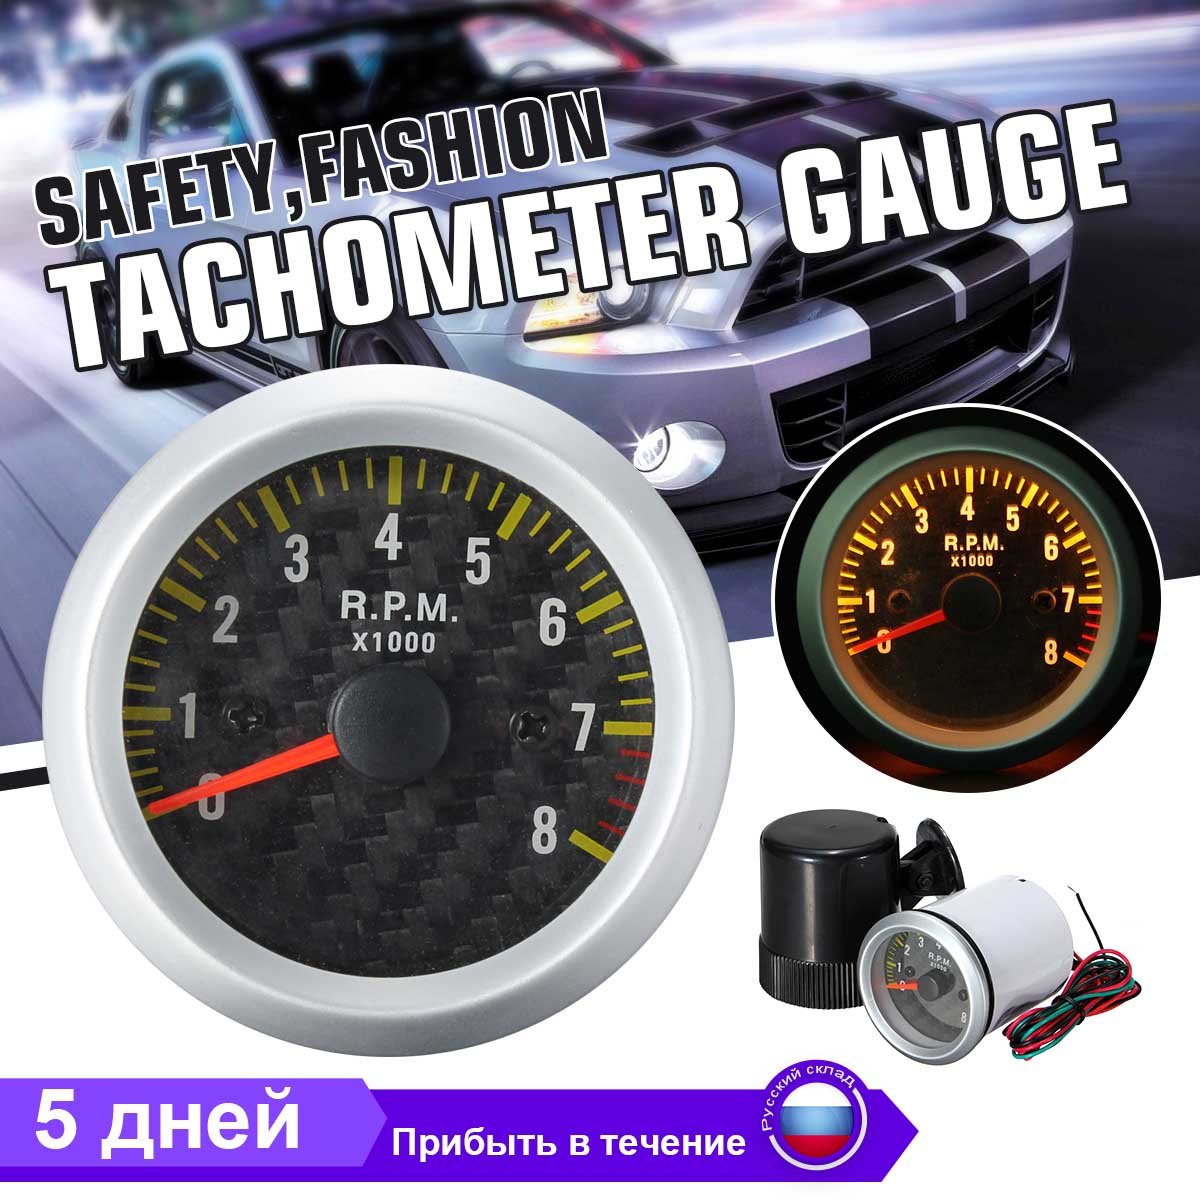 2in//52mm LED Tacho Gauge Tachometer Carbon Fiber Face Yellow LED 0-8000 RPM